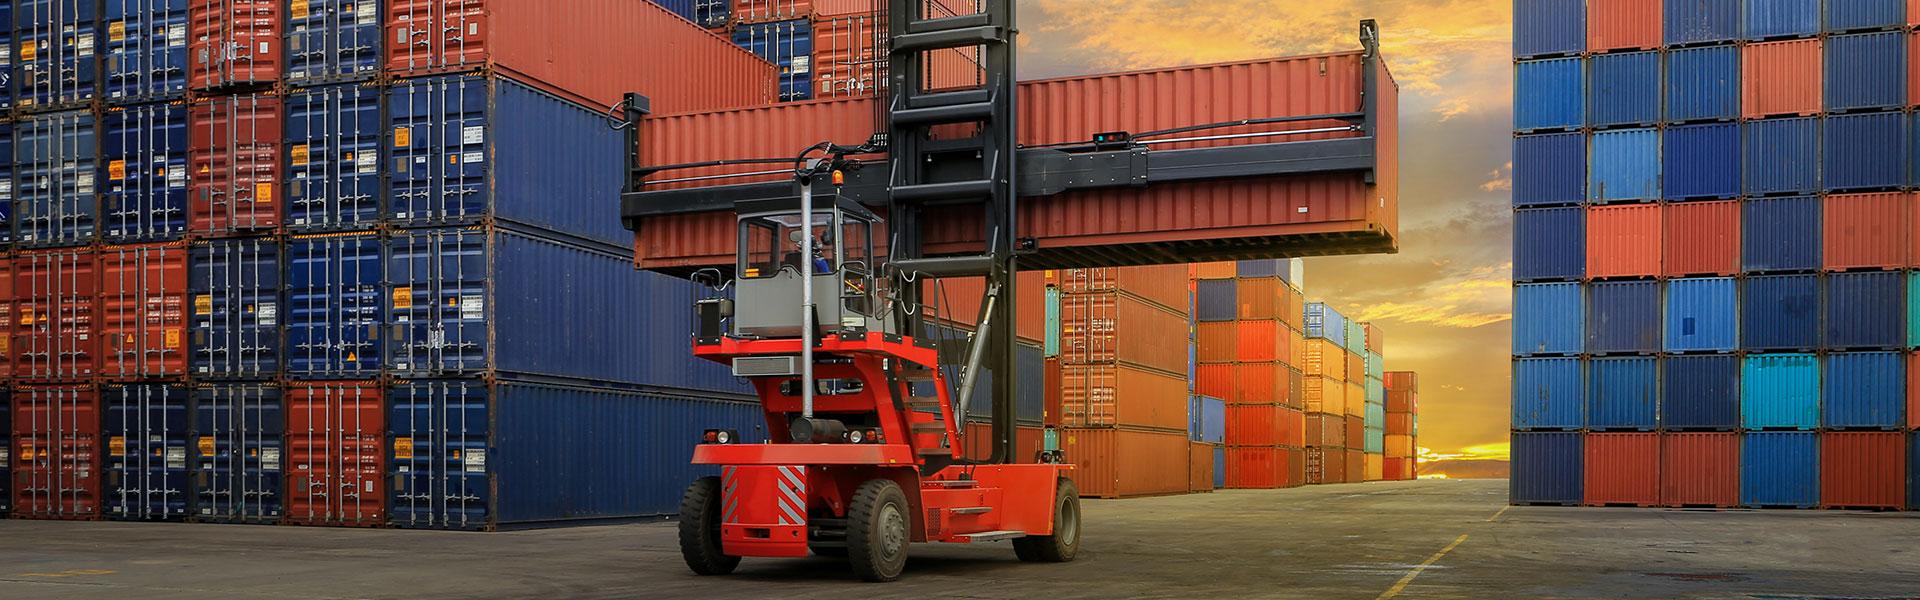 Gabelstapler verlädt Container am Flughafen